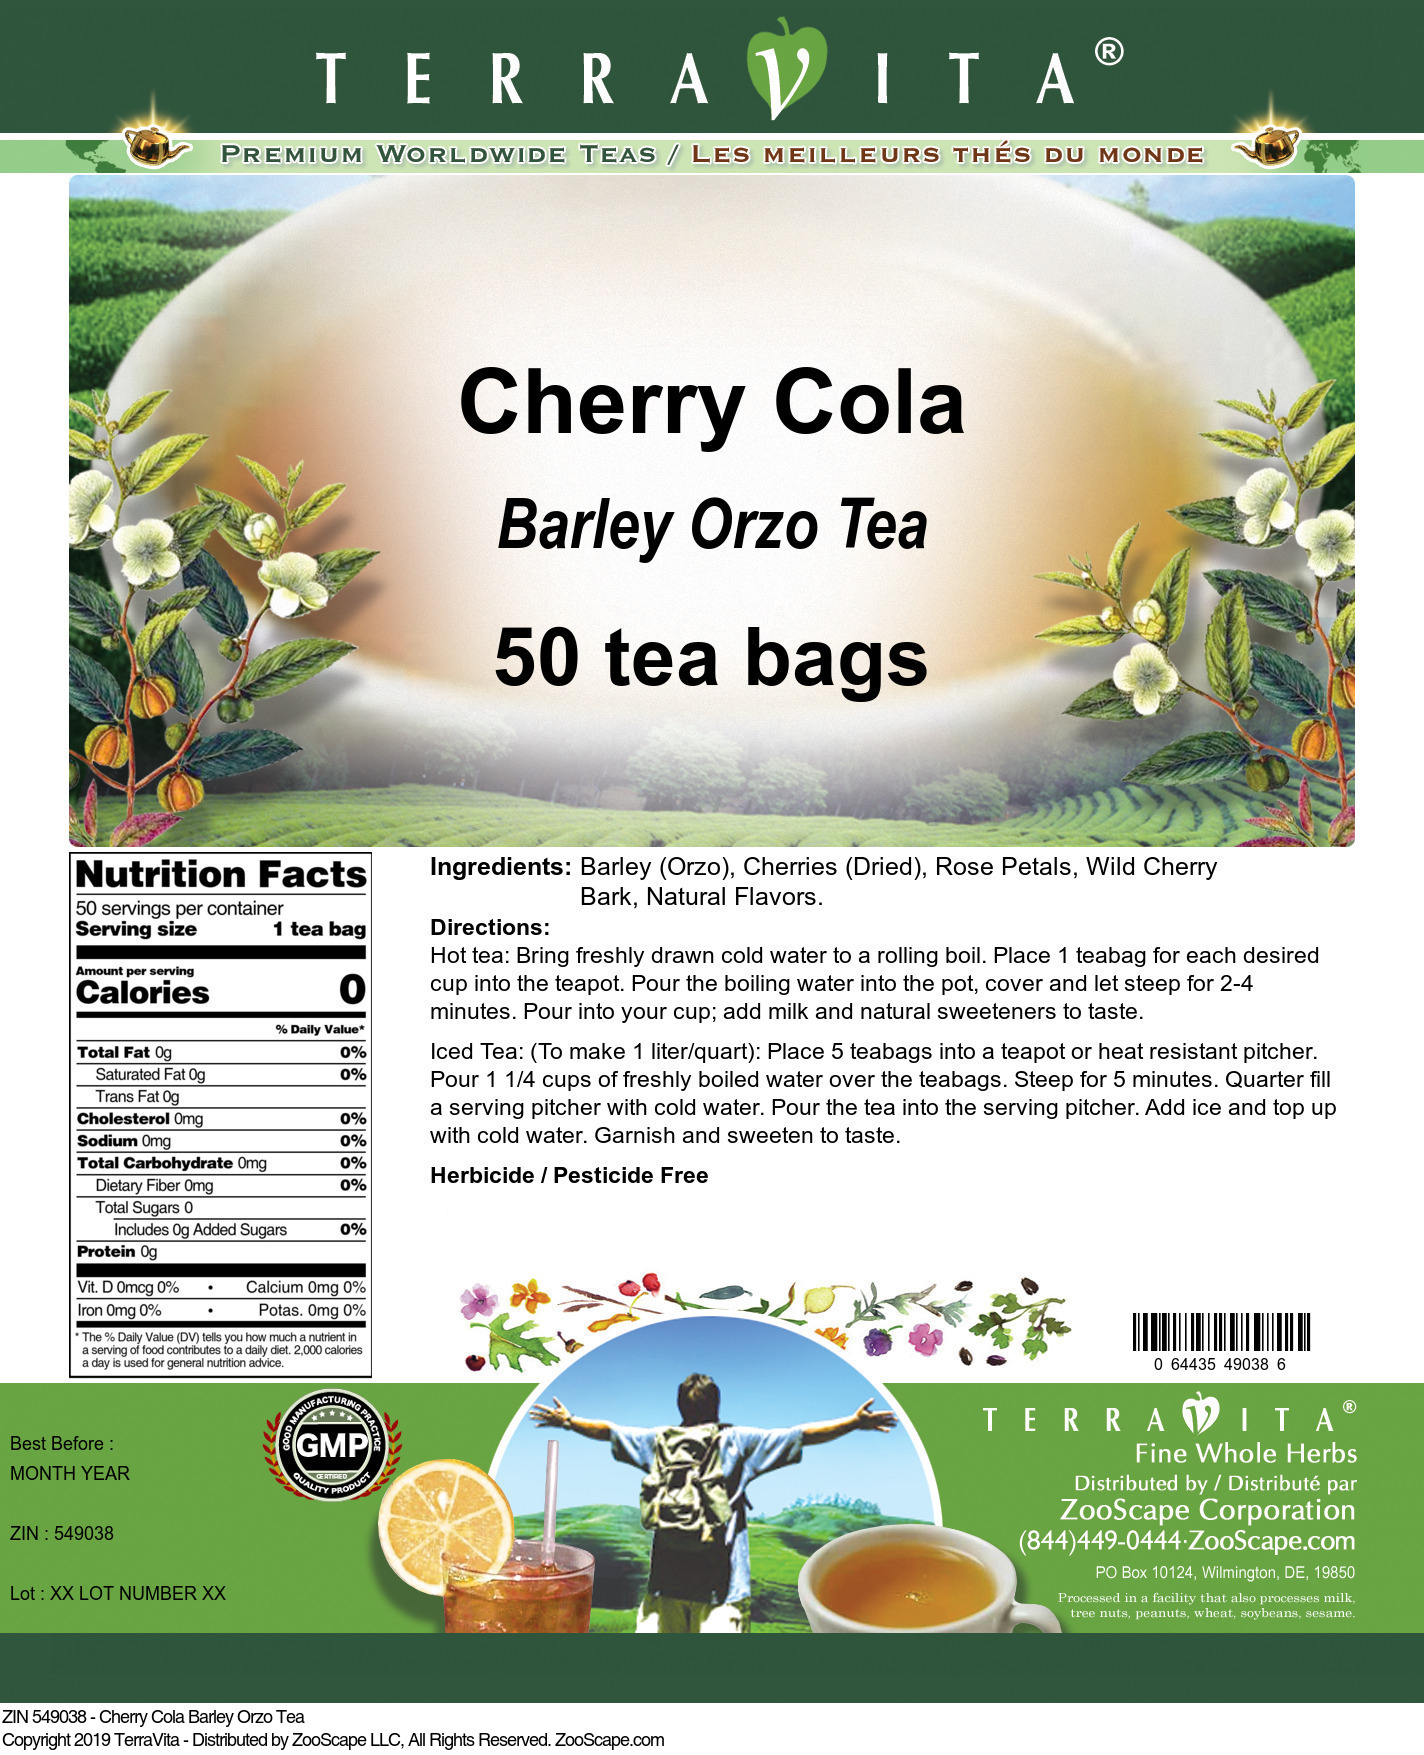 Cherry Cola Barley Orzo